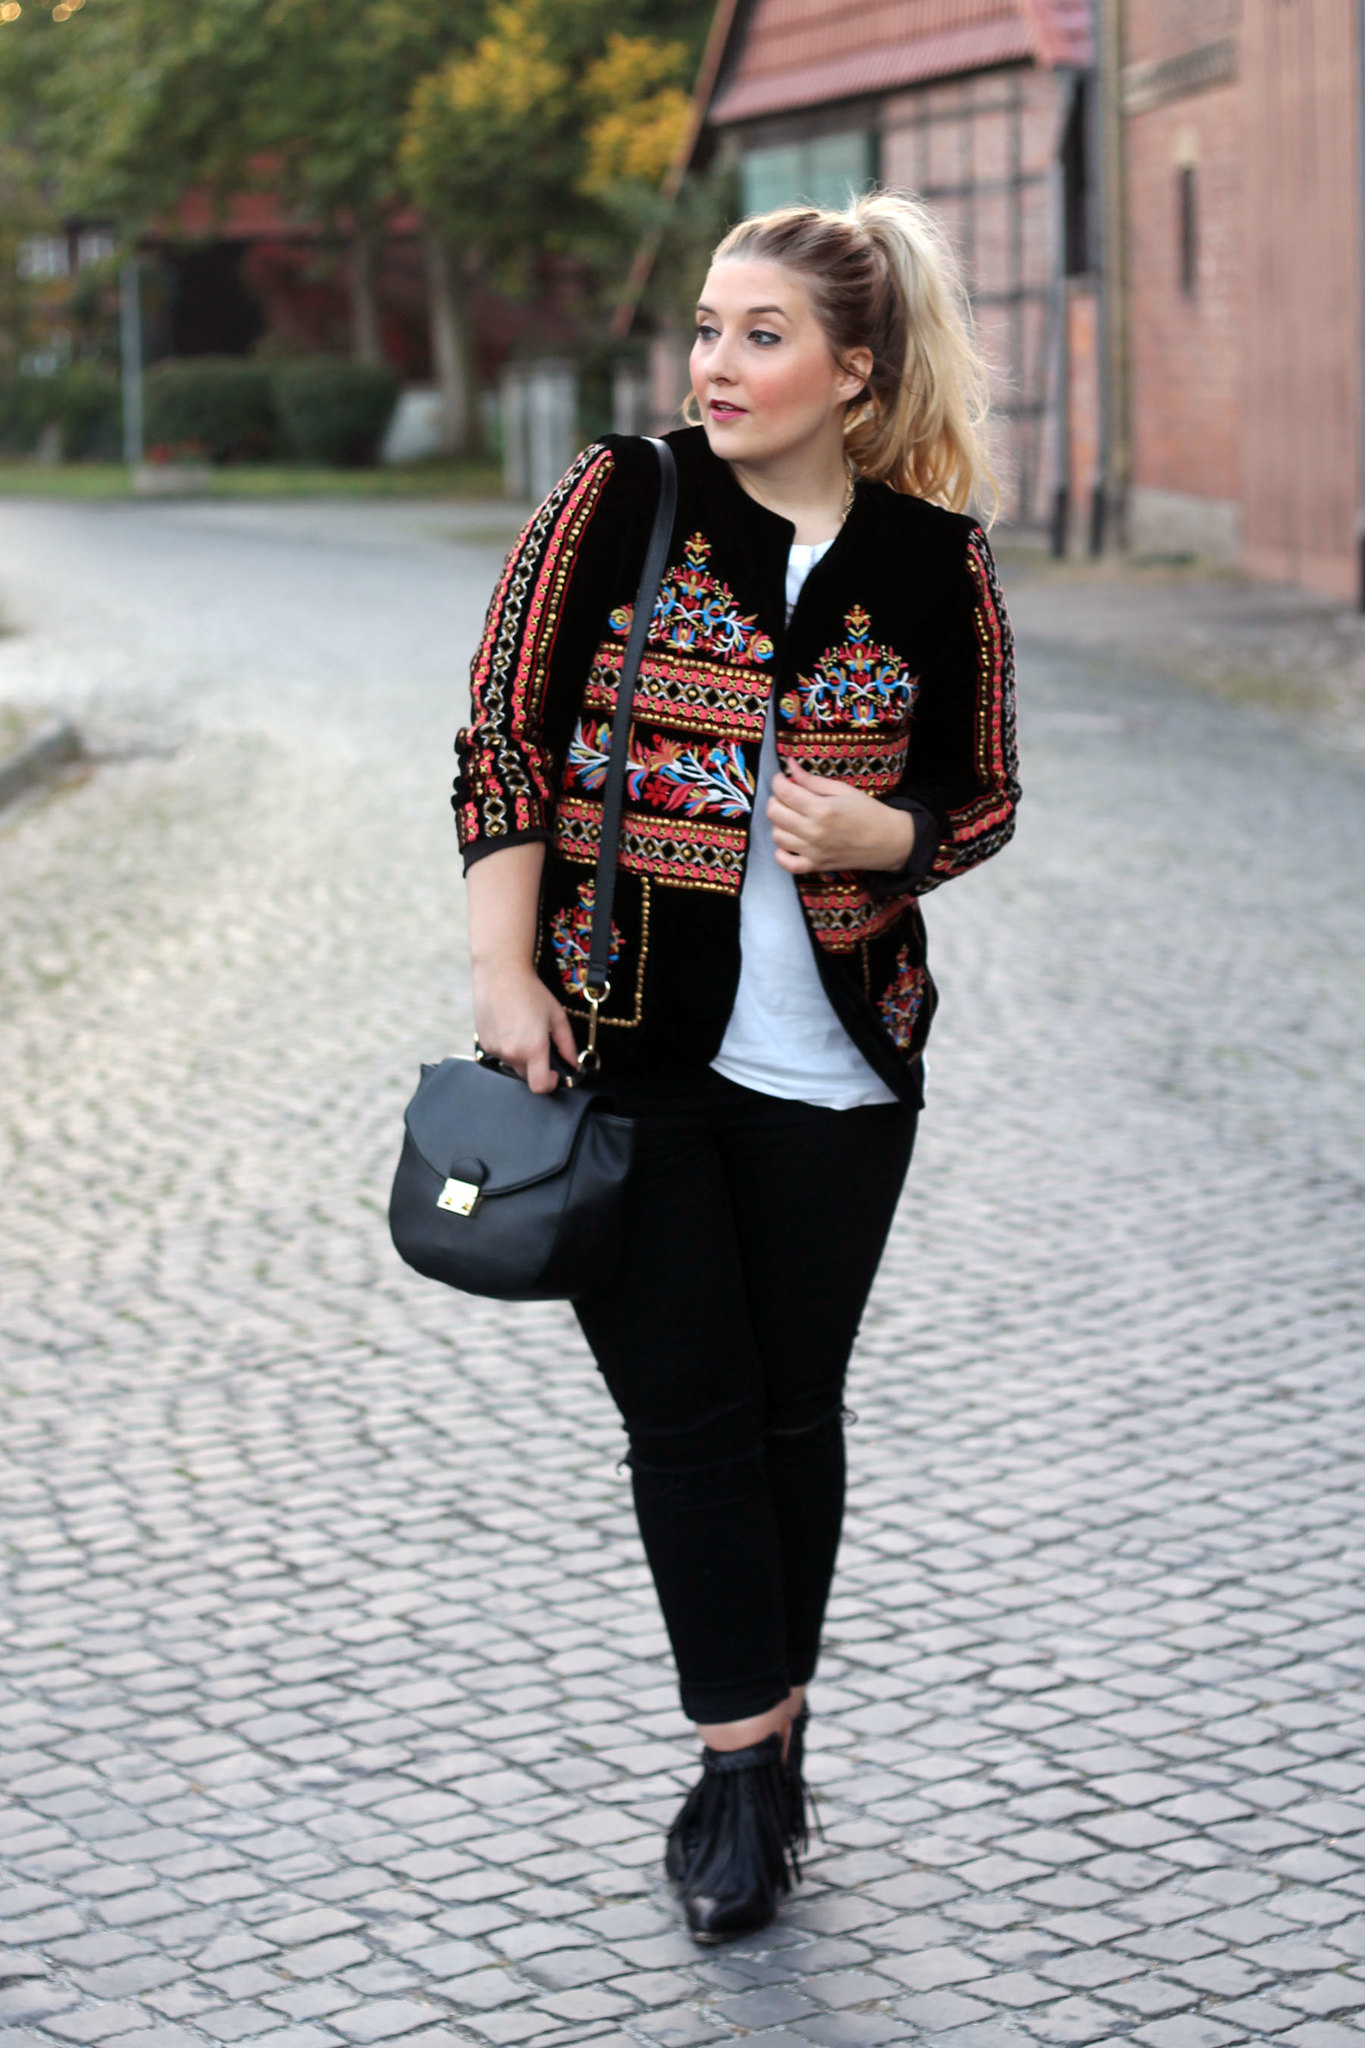 zara-jacke-folklore-trend-modeblog-fashionblog-top-deutschland-berlin